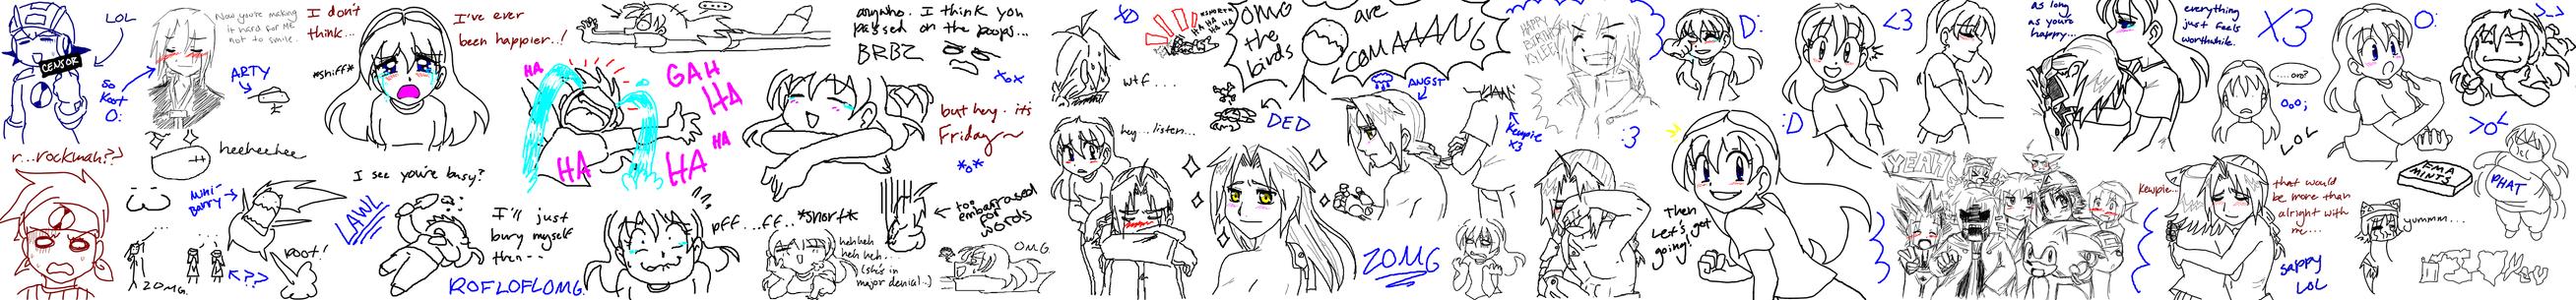 MSN Chat Doodles by SonicRocksMySocks